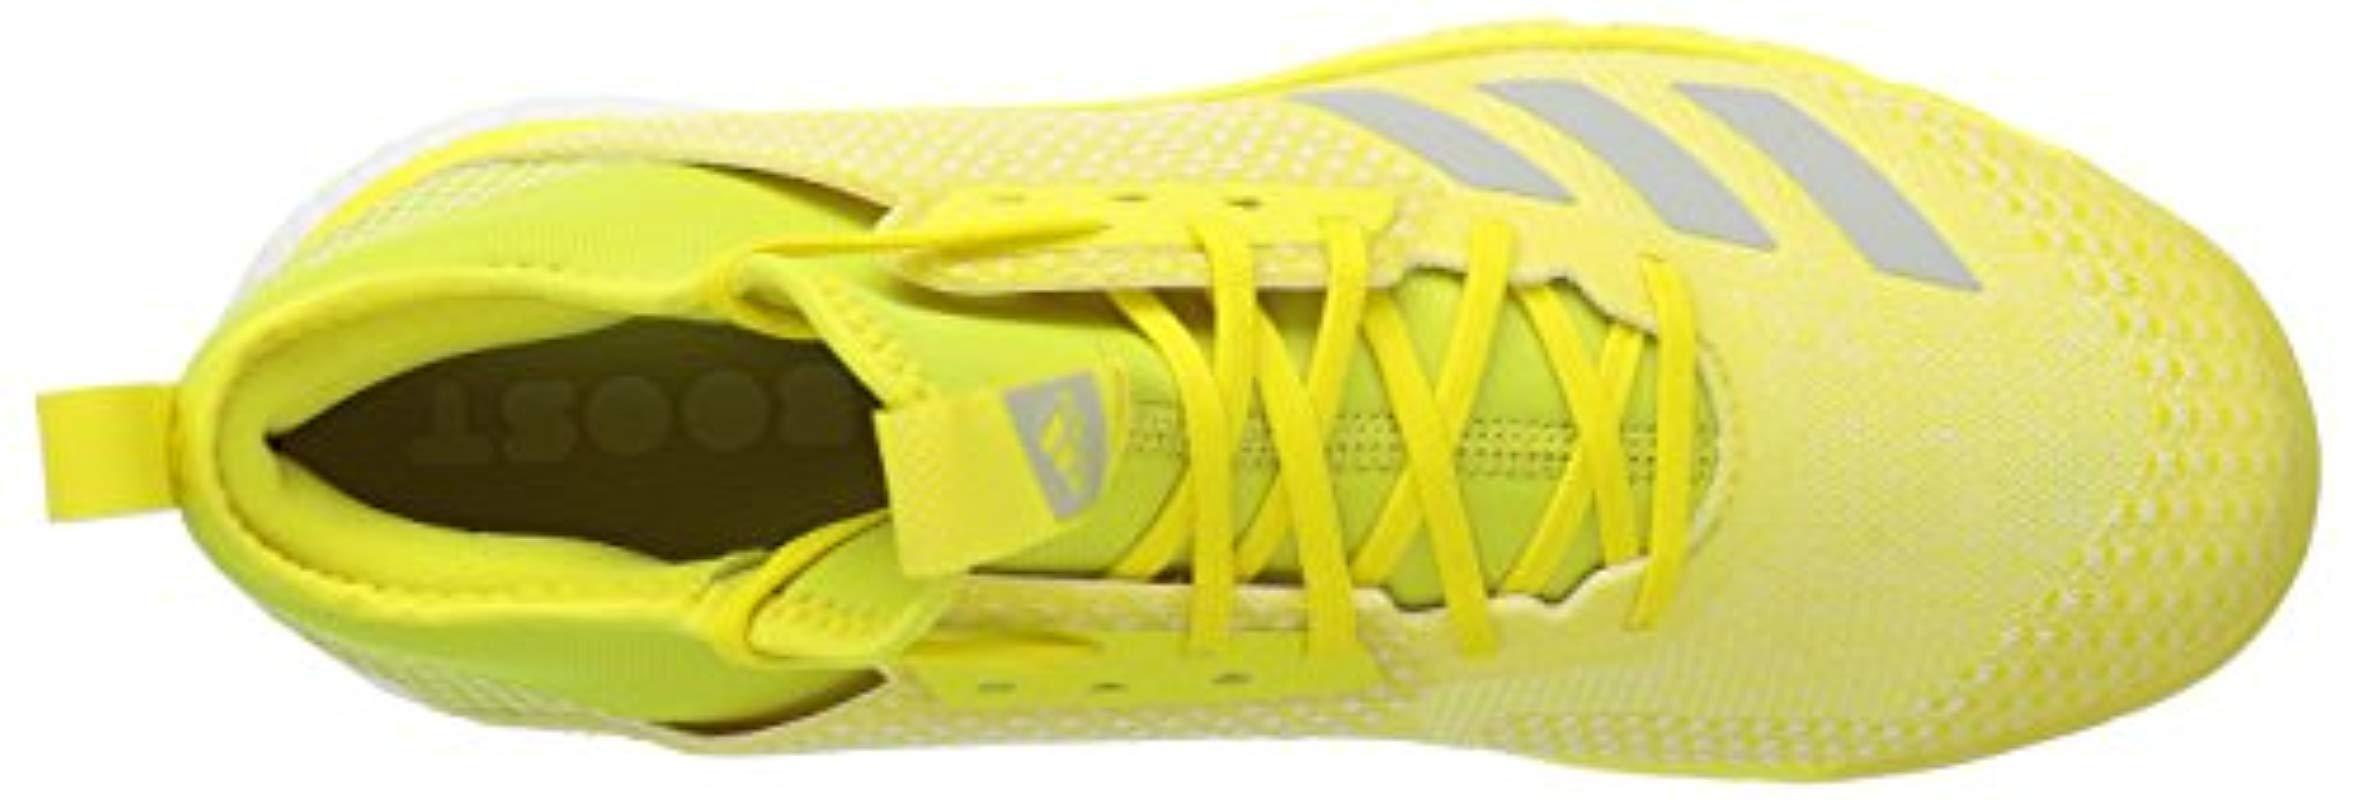 quality design 2b45a 2938a Adidas - Yellow Crazyflight X 2 Mid Volleyball Shoe - Lyst. View fullscreen